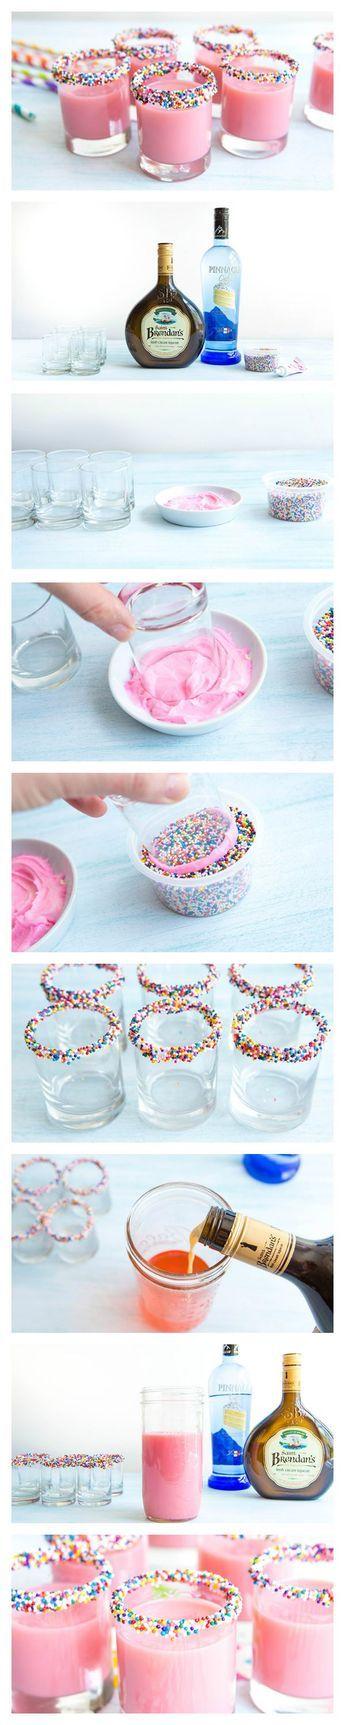 Bright pink shots that taste just like birthday cake! Or strawberry milk!!!